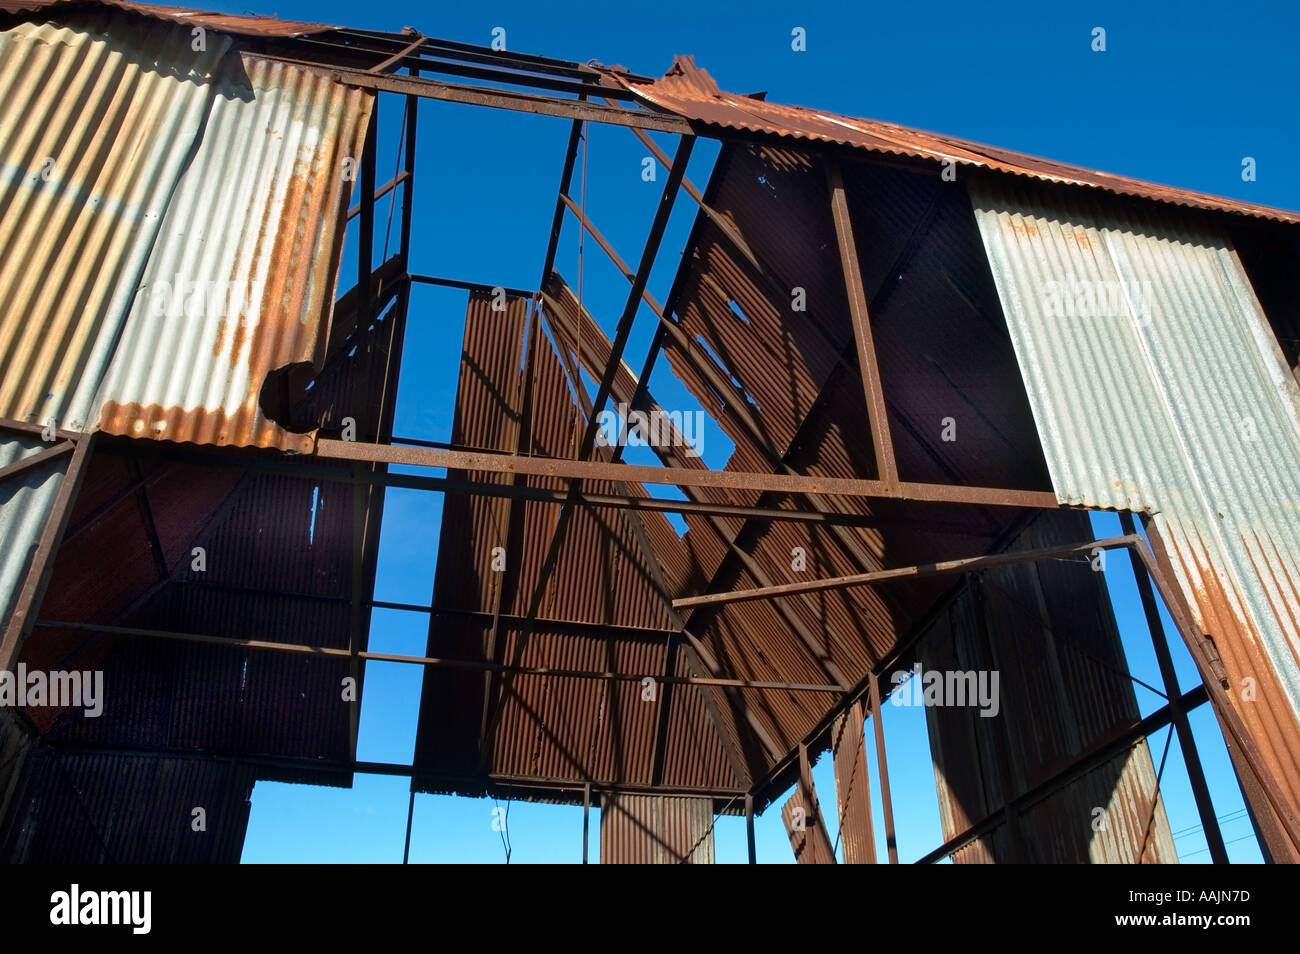 3e3cd2d159 Tiaro Stock Photos   Tiaro Stock Images - Alamy